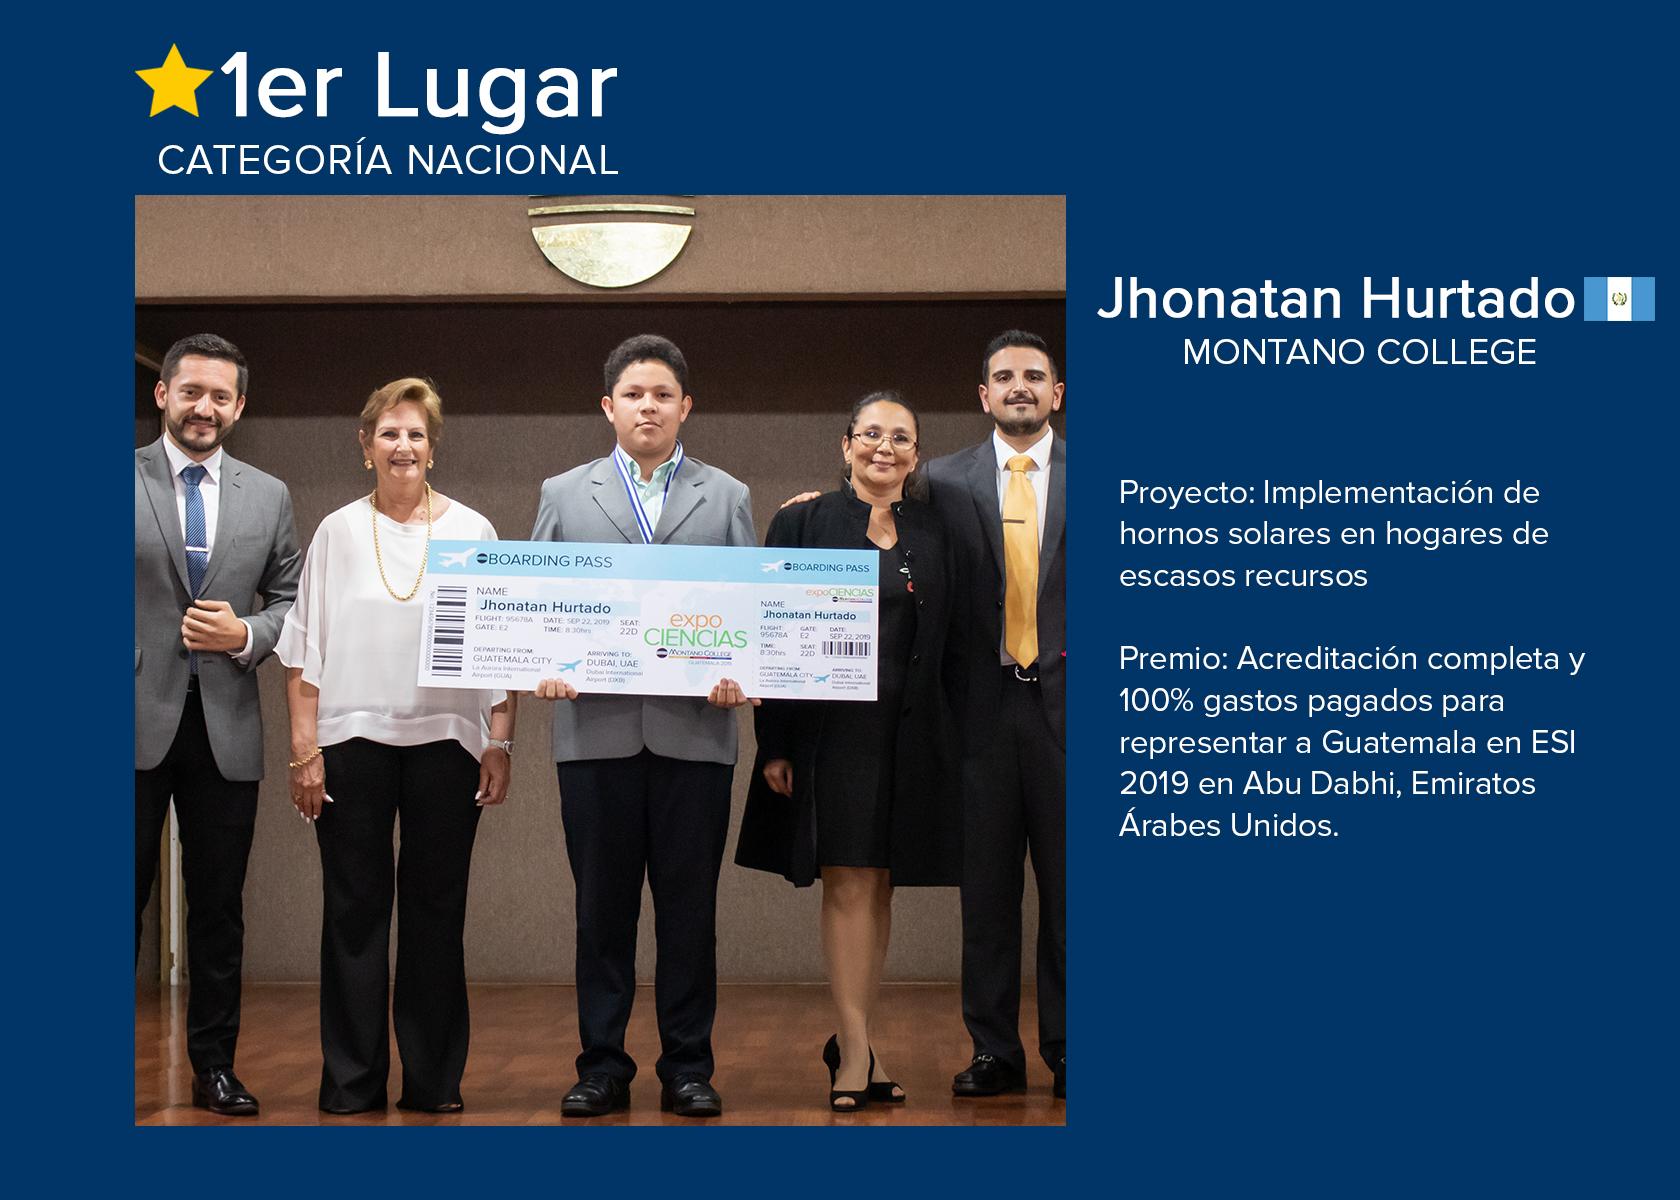 PRIMER LUGAR:  JHONATHAN HURTADO